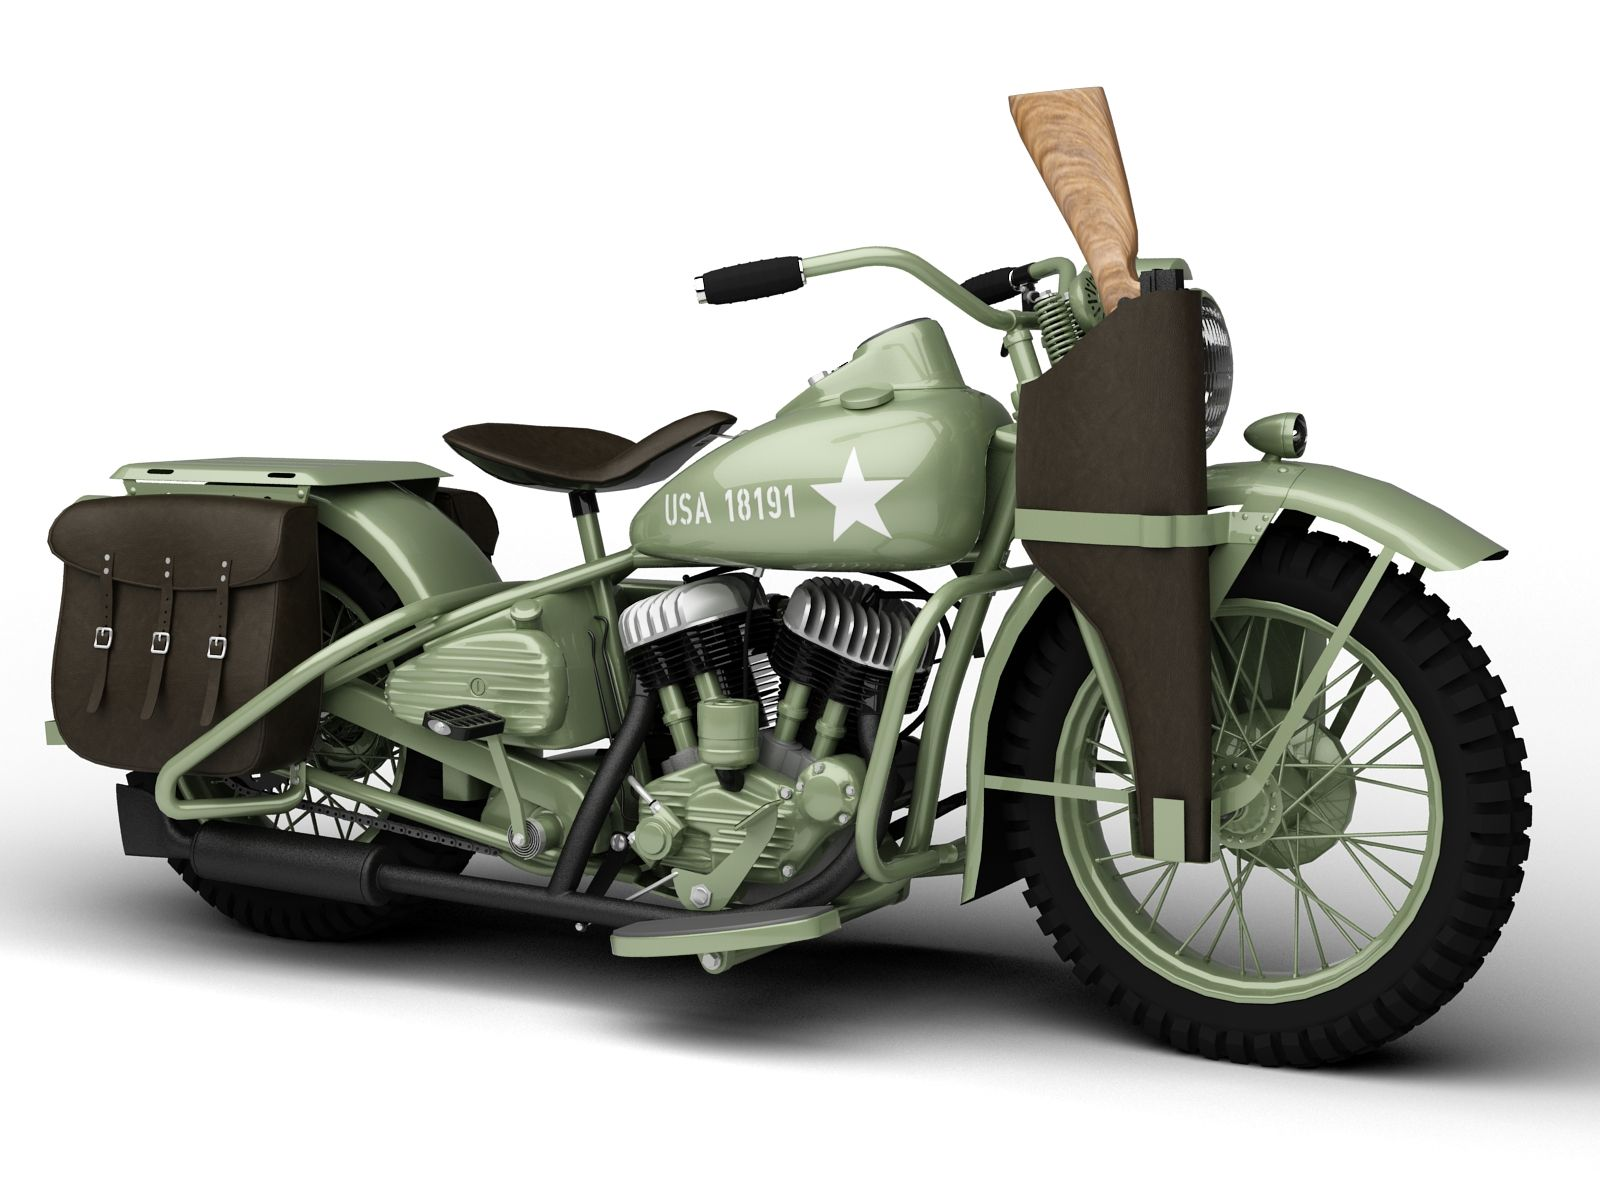 3D Model Motorbike 1942 WWII | fbx obj max 3ds c4d dxf - 3D